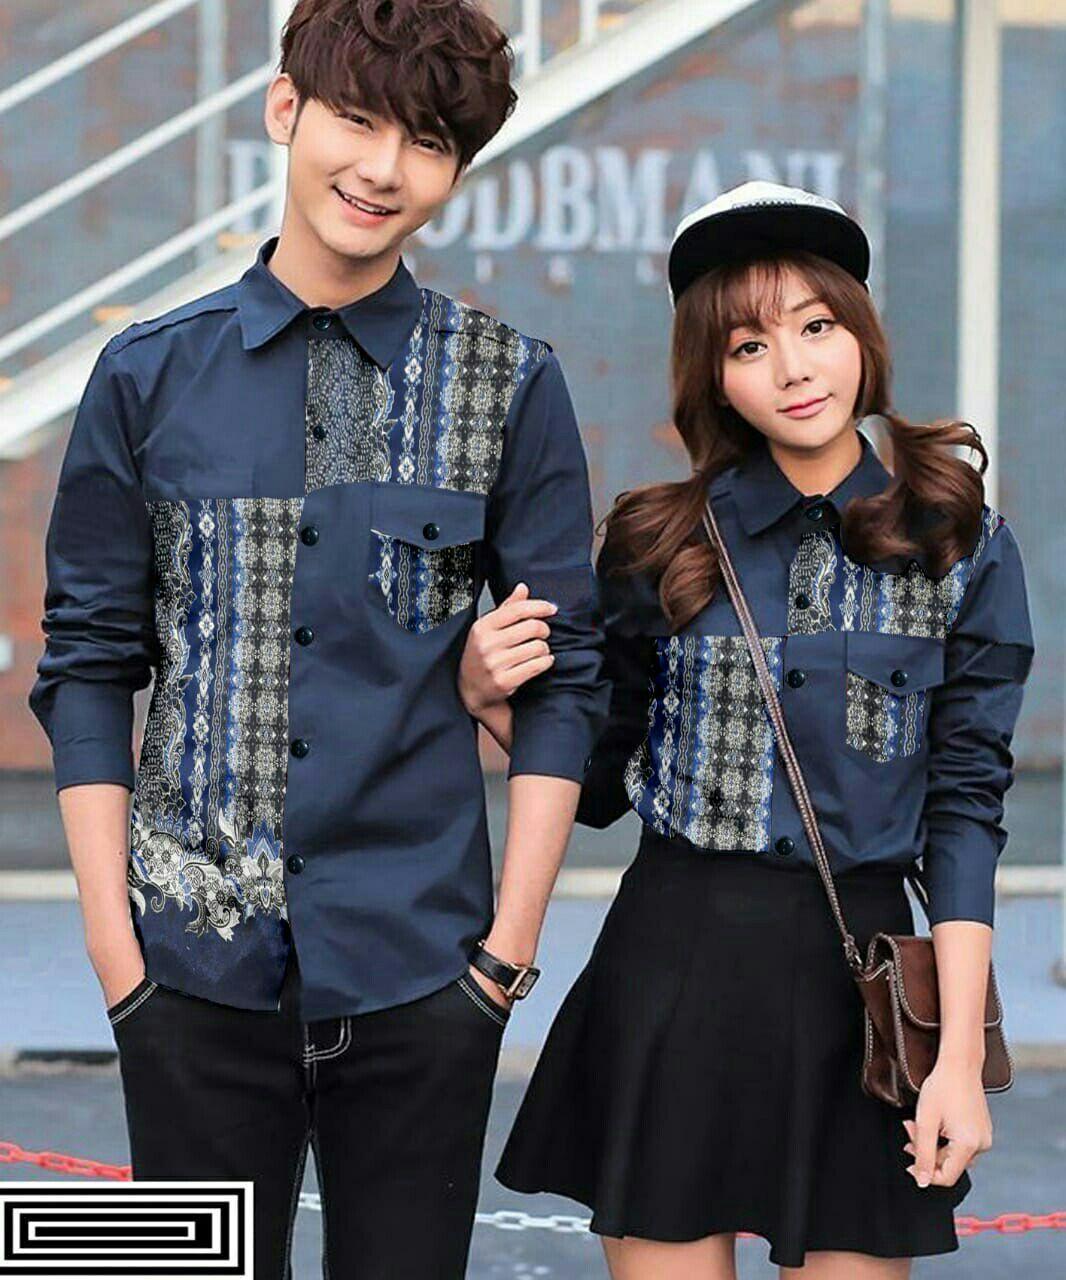 Lazda/Nf/Cp Eudora/Baju batik pasangan